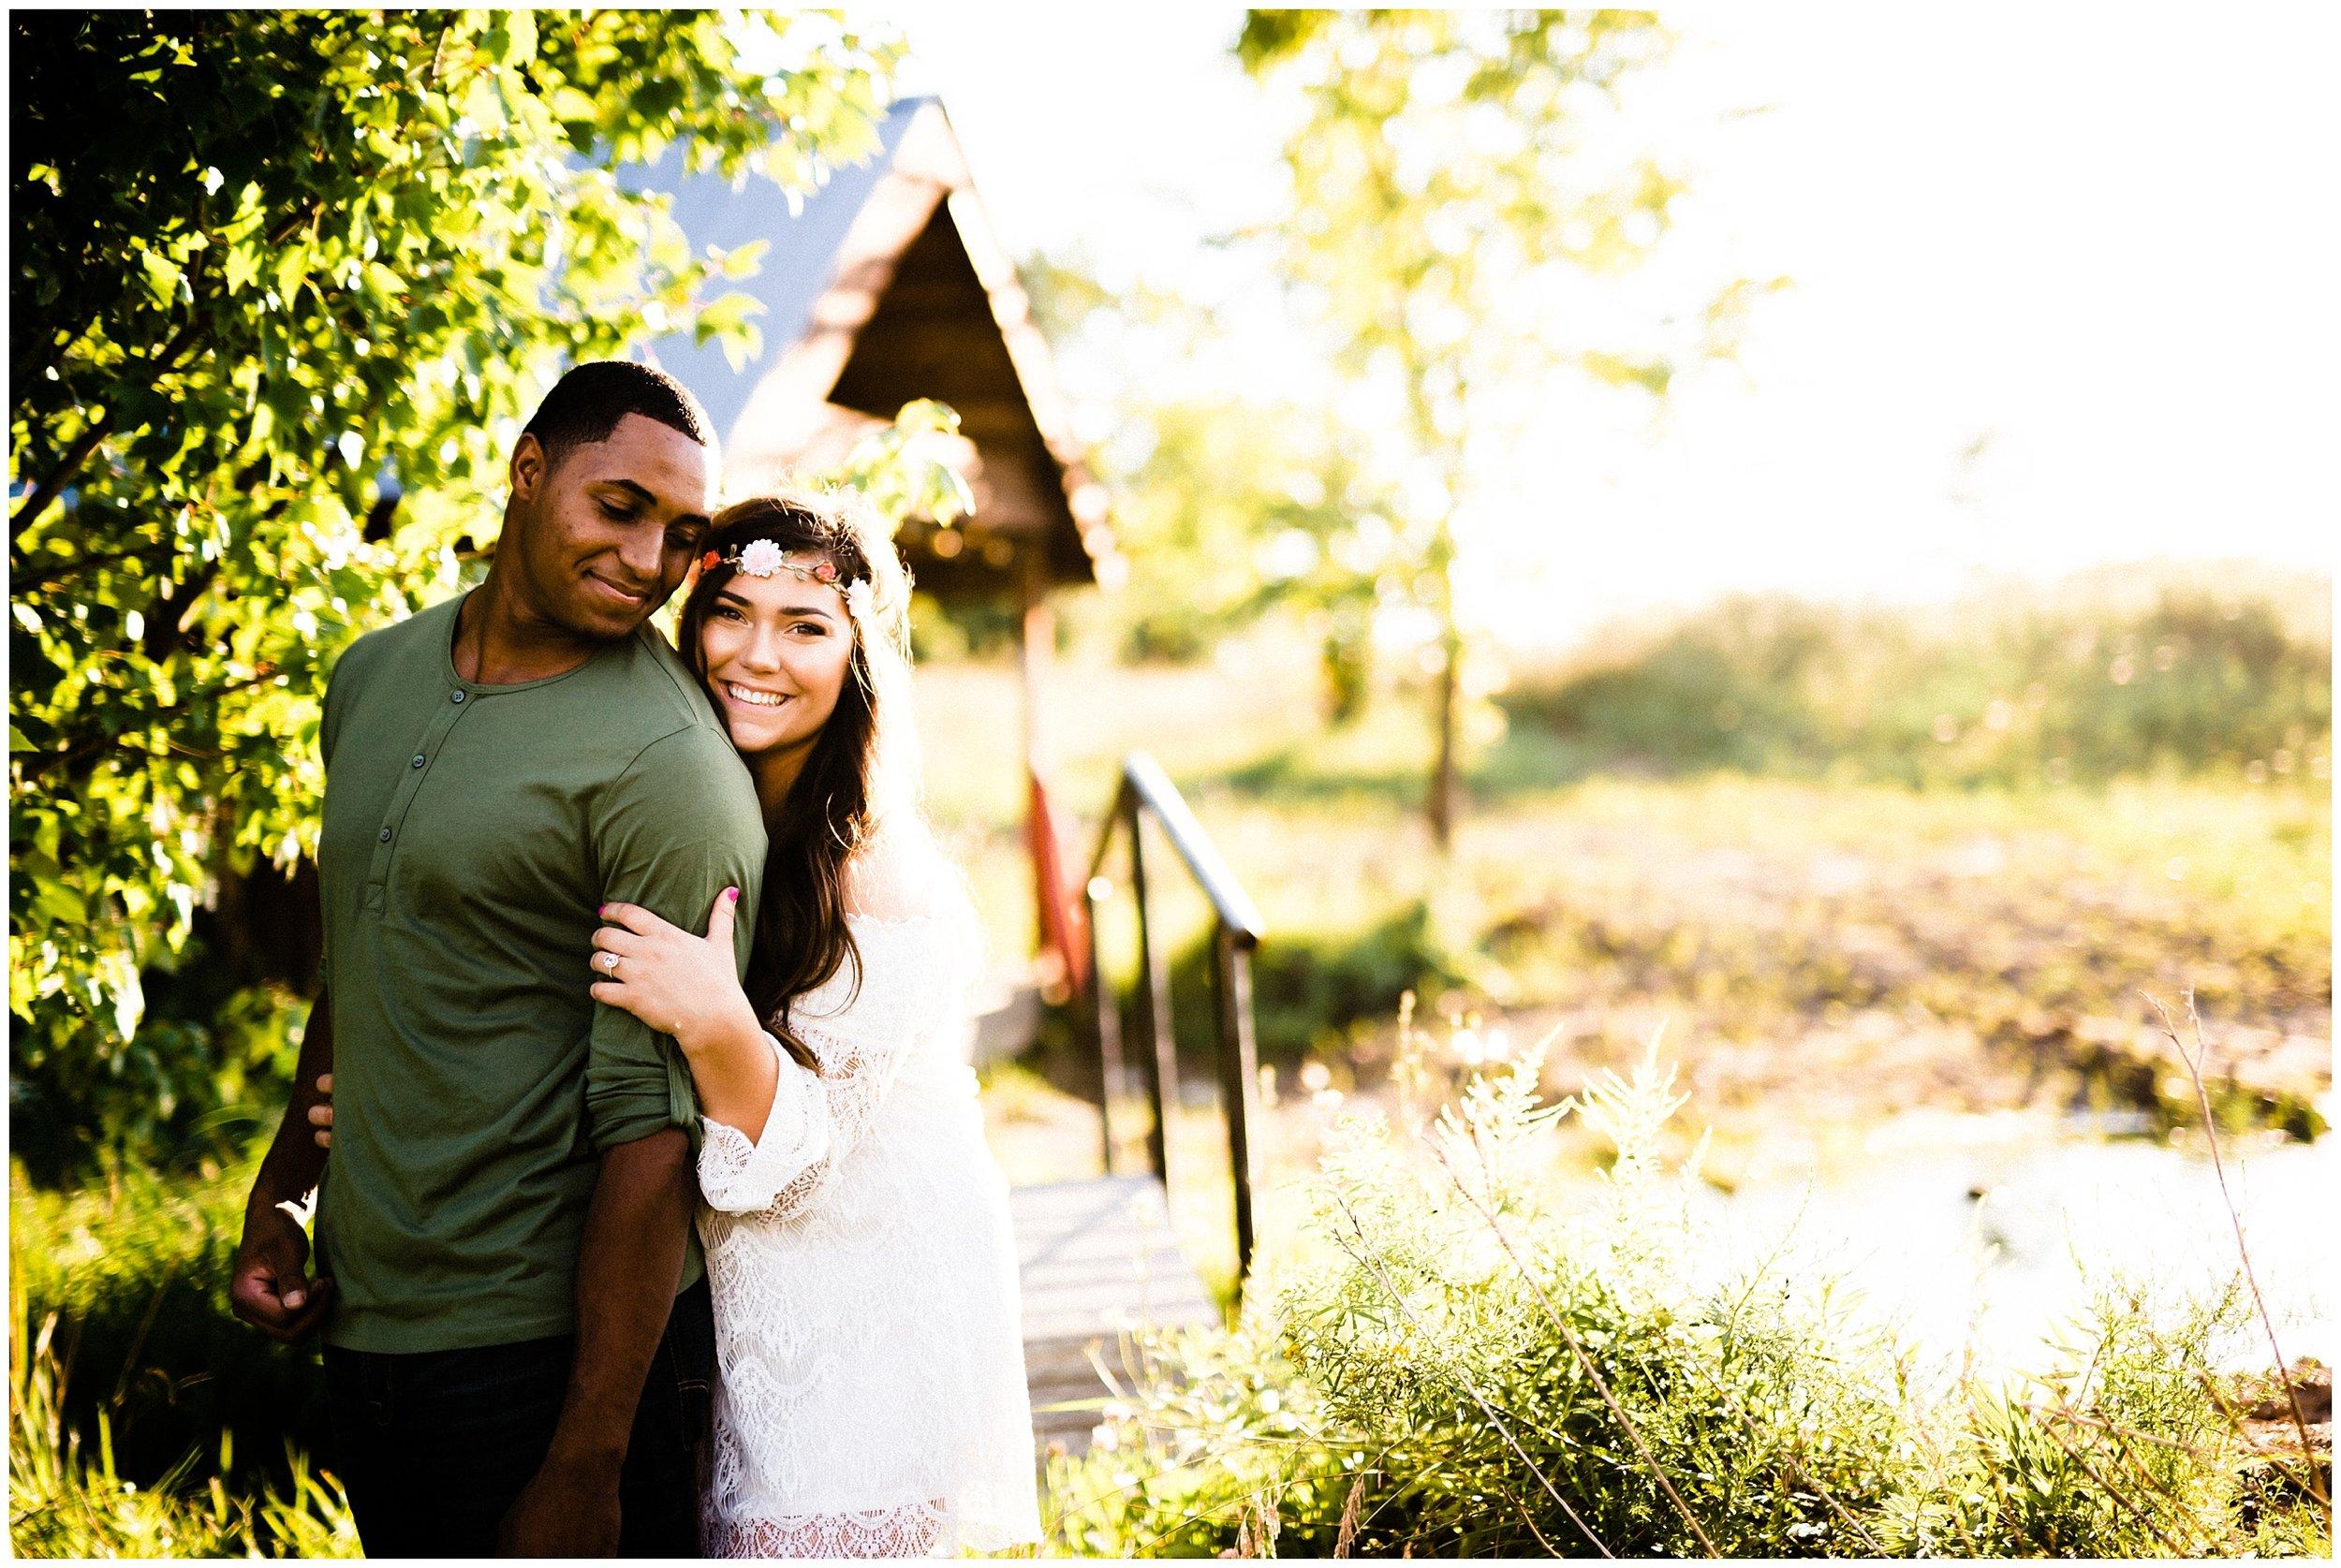 Tabias + Zabrea | Engaged  #kyleepaigephotography_0658.jpg